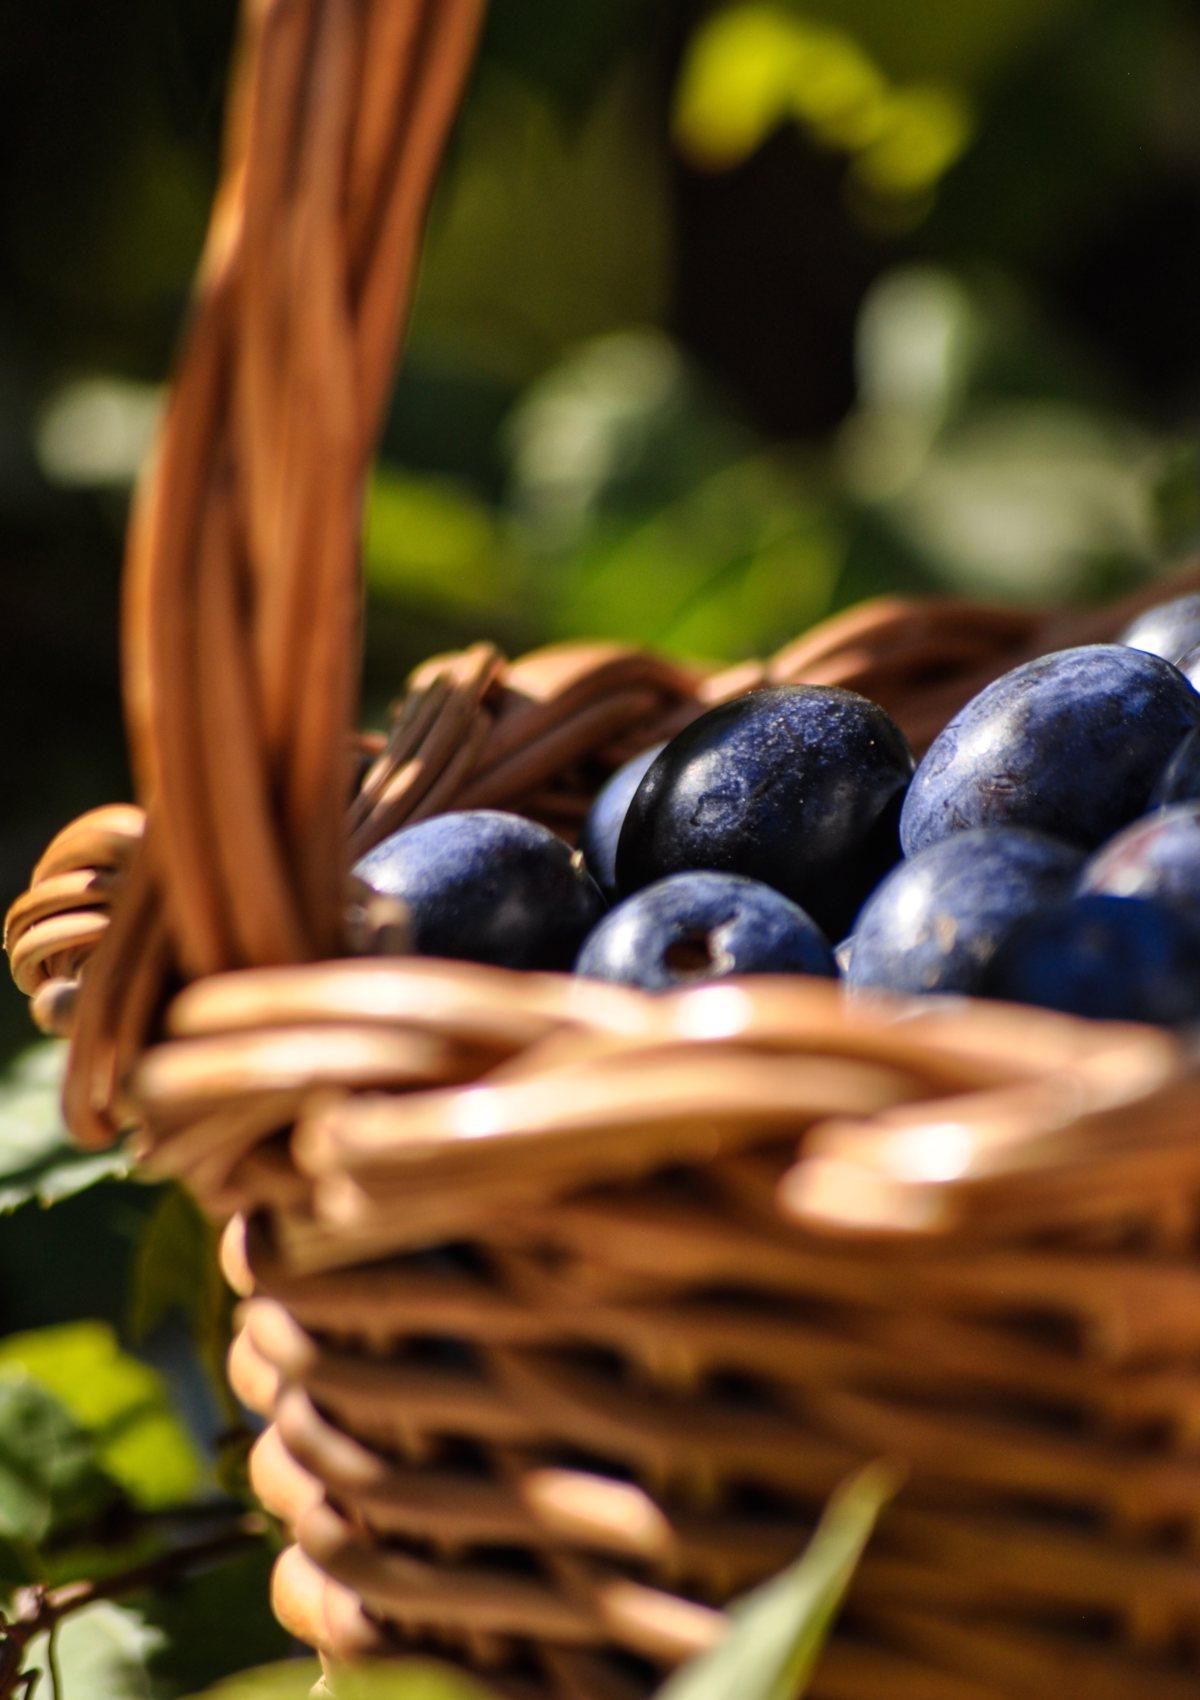 Plum harvest in a basket